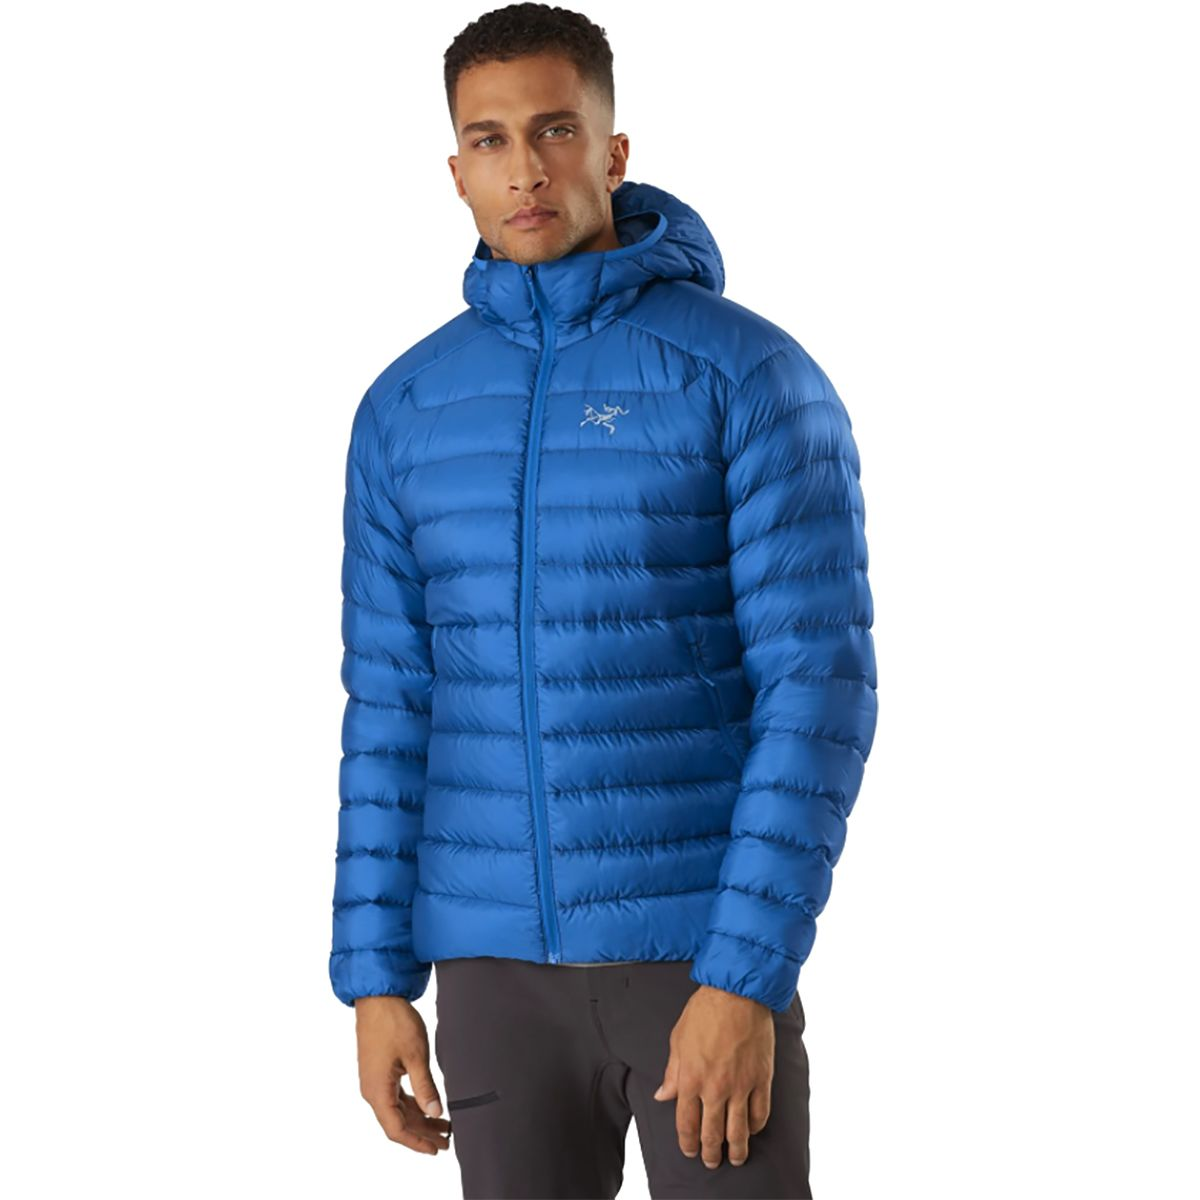 Cerium LT Hooded Down Jacket - Men